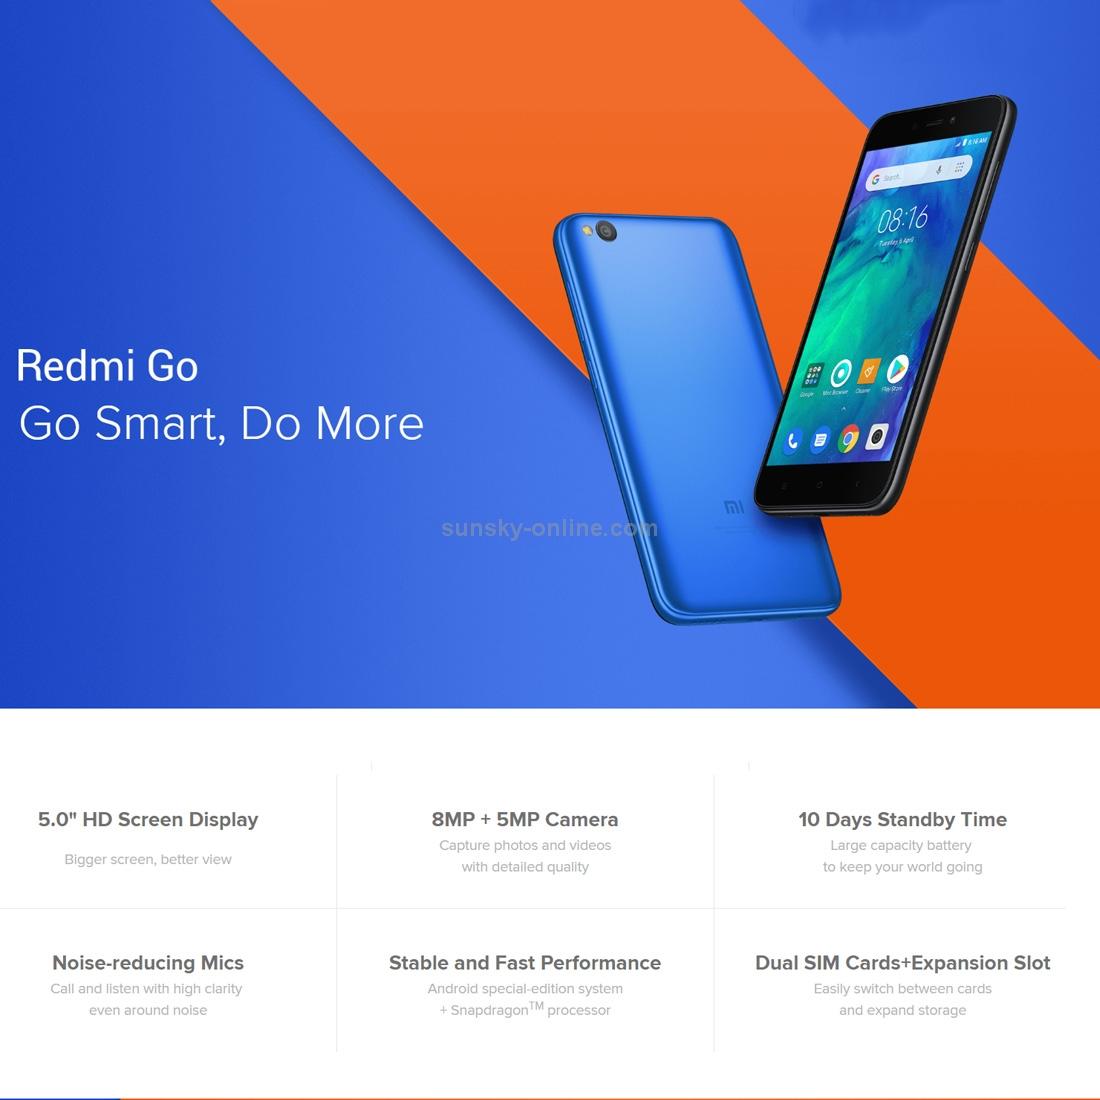 SUNSKY - [คลังสินค้า HK] Xiaomi Redmi Go, 1GB 8GB, เวอร์ชั่นเป็น